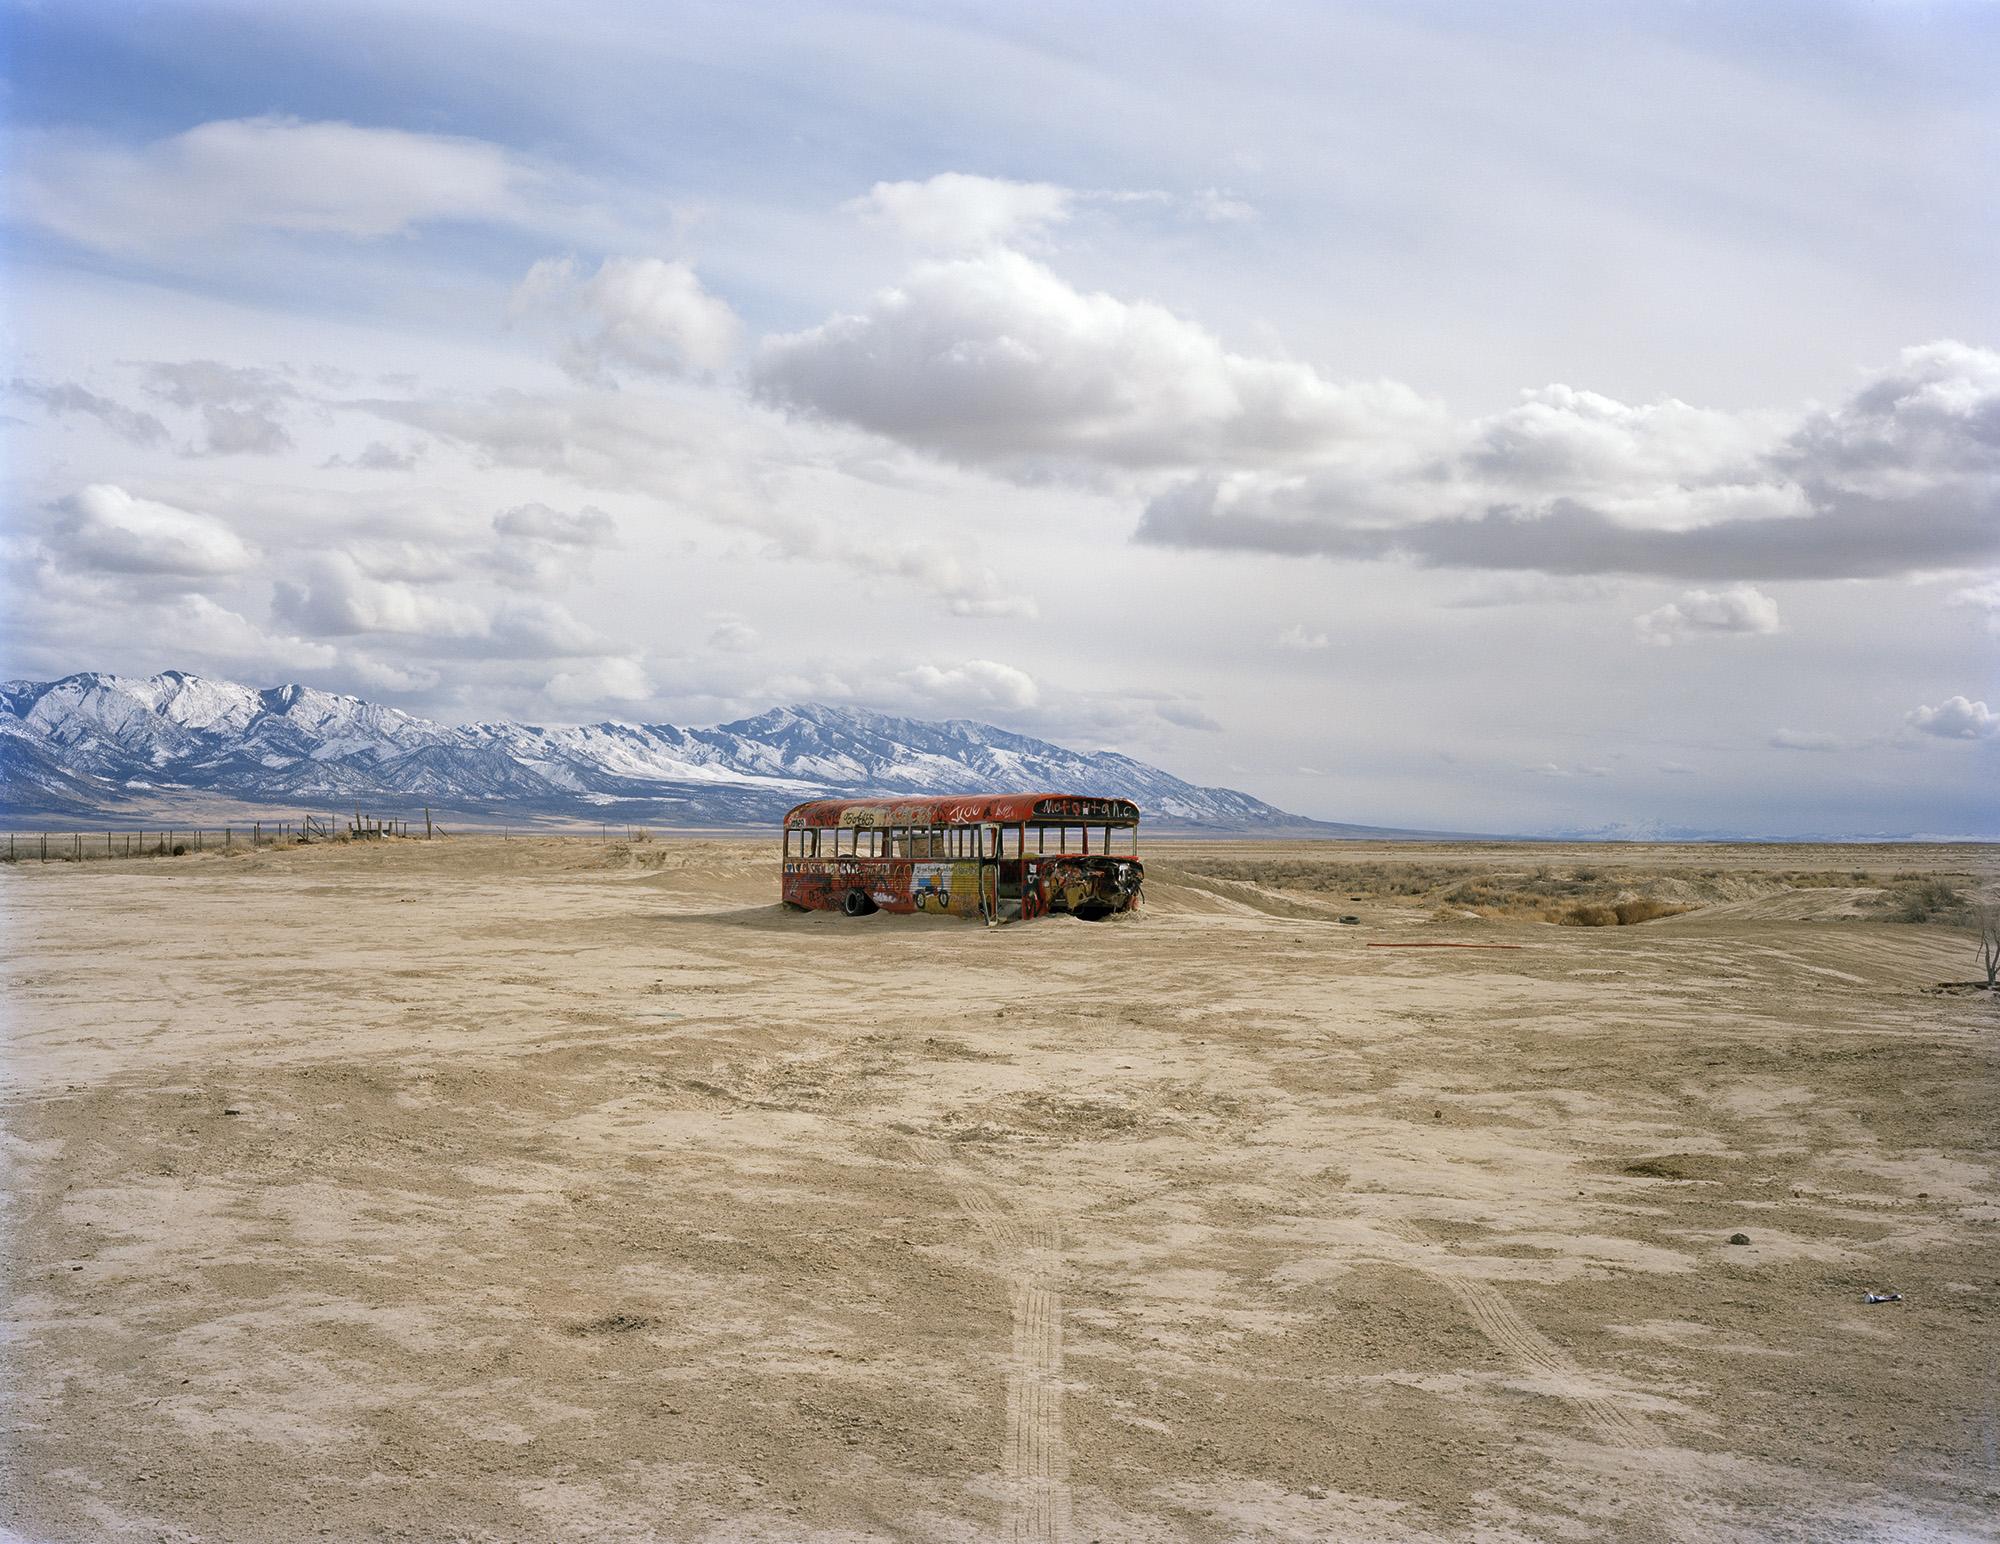 Untitled (School Bus), Delle, UT.